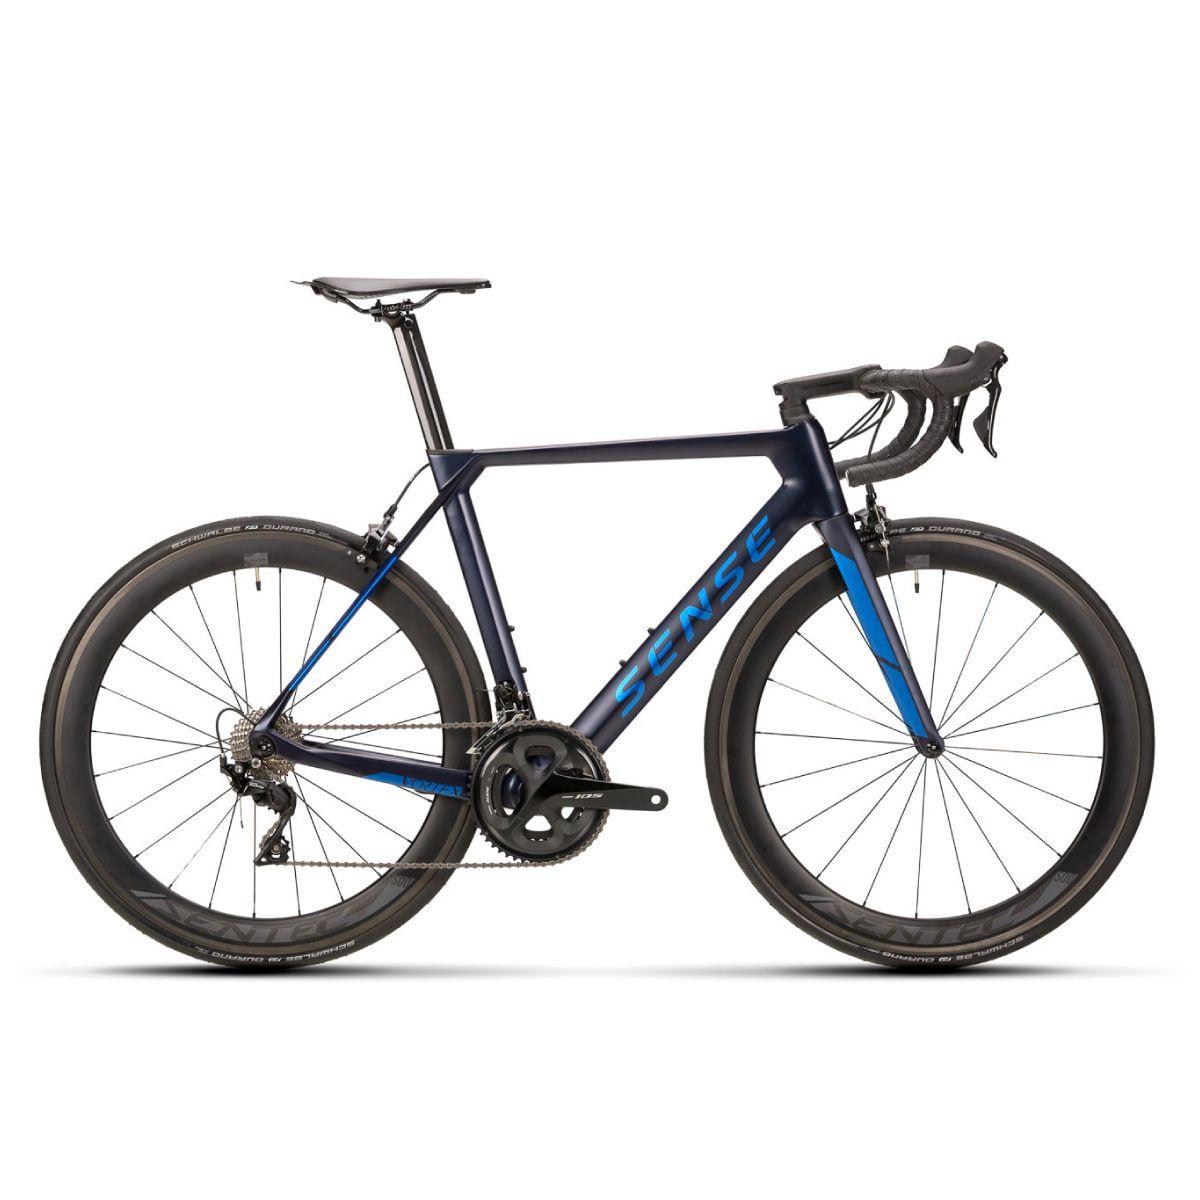 Bike Sense Vortex 2020 Full Carbon Shimano 105